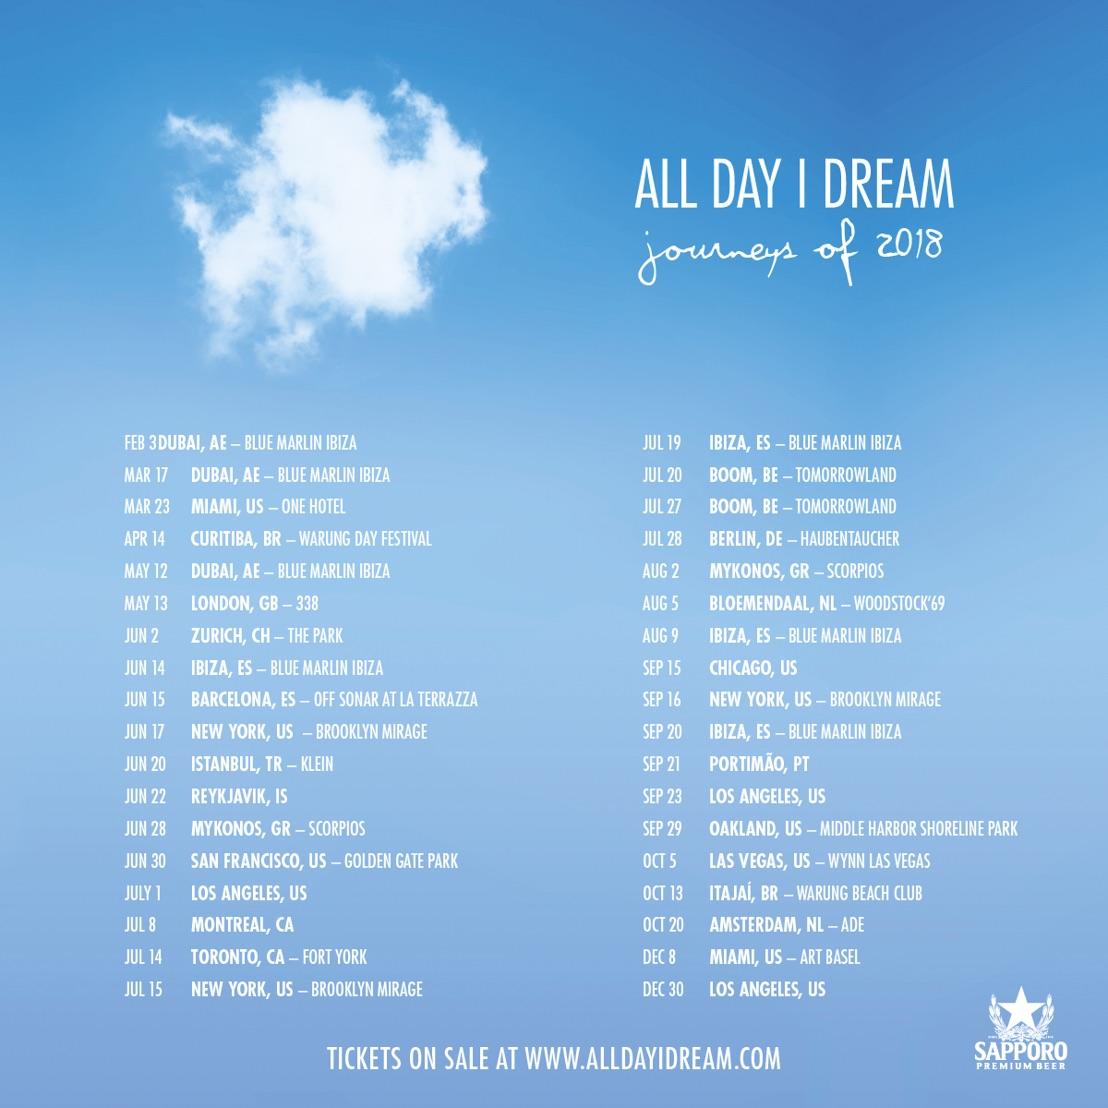 All Day I Dream 2018 World Tour Journeys Of 2018